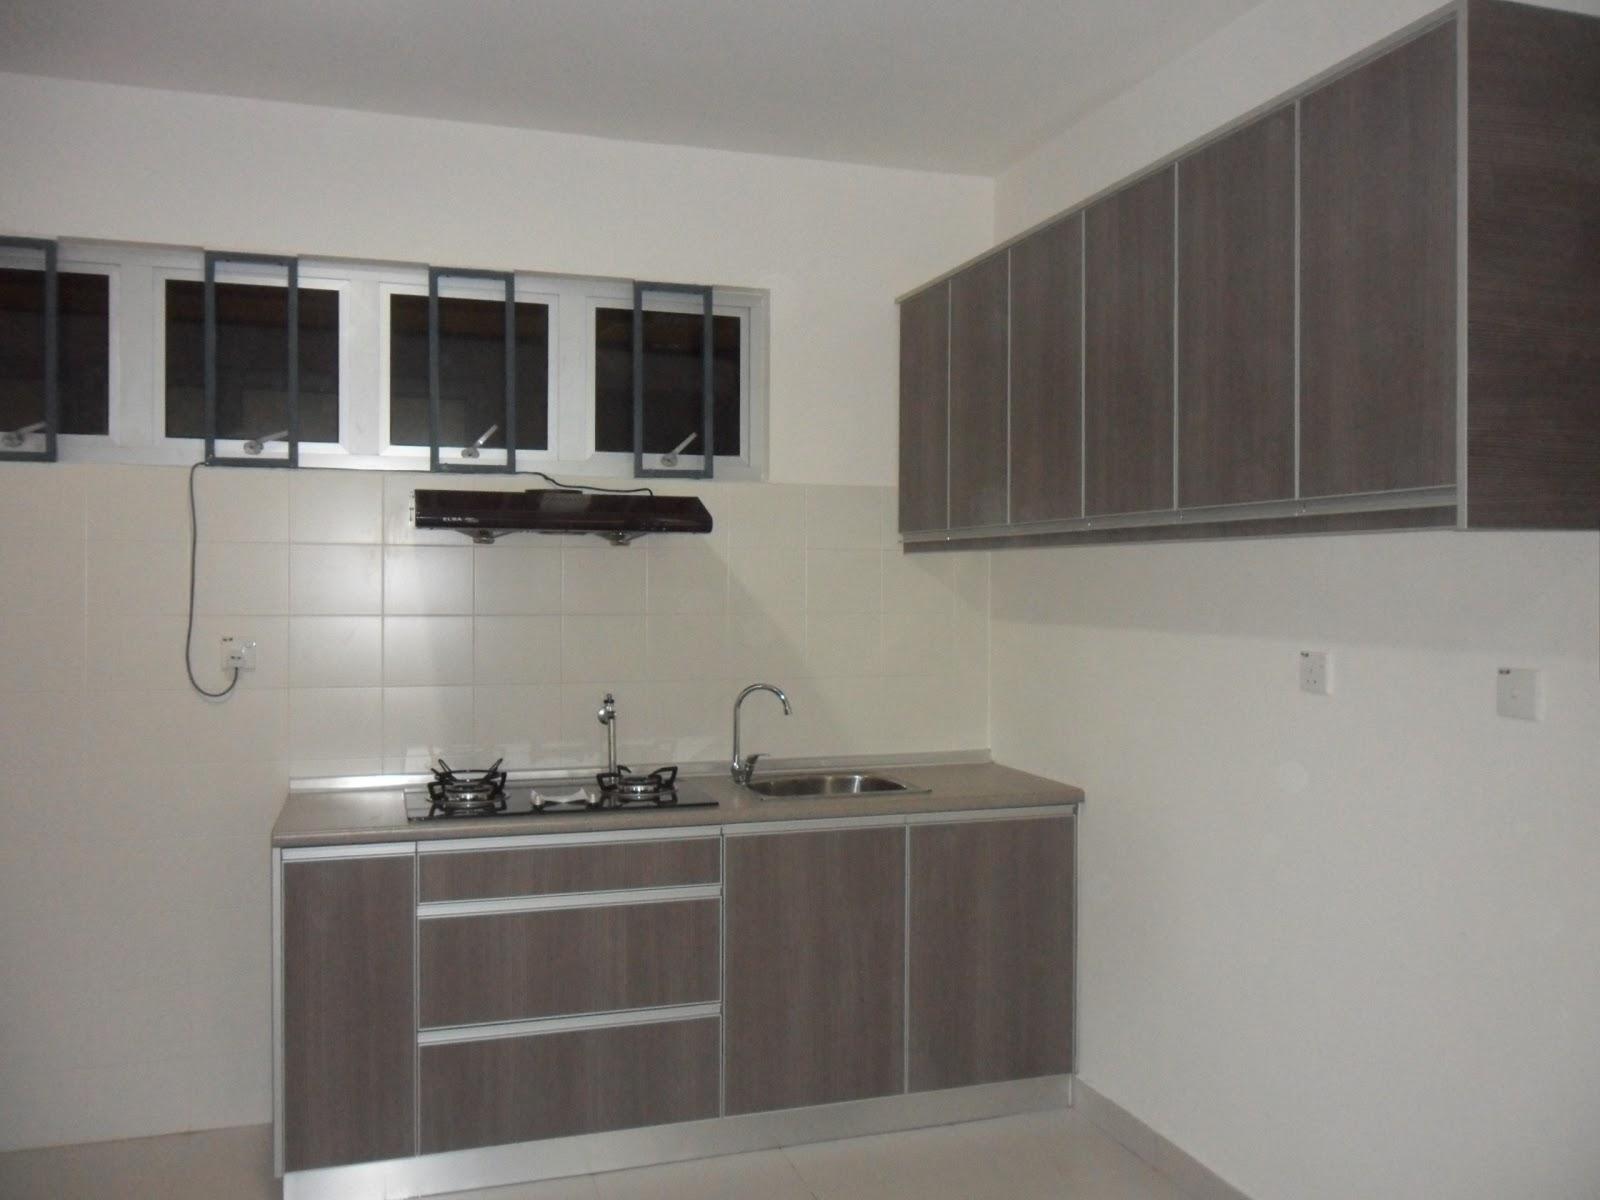 Cheryl Chan Property 1 Room In Domain 3 Cyberjaya For Rent